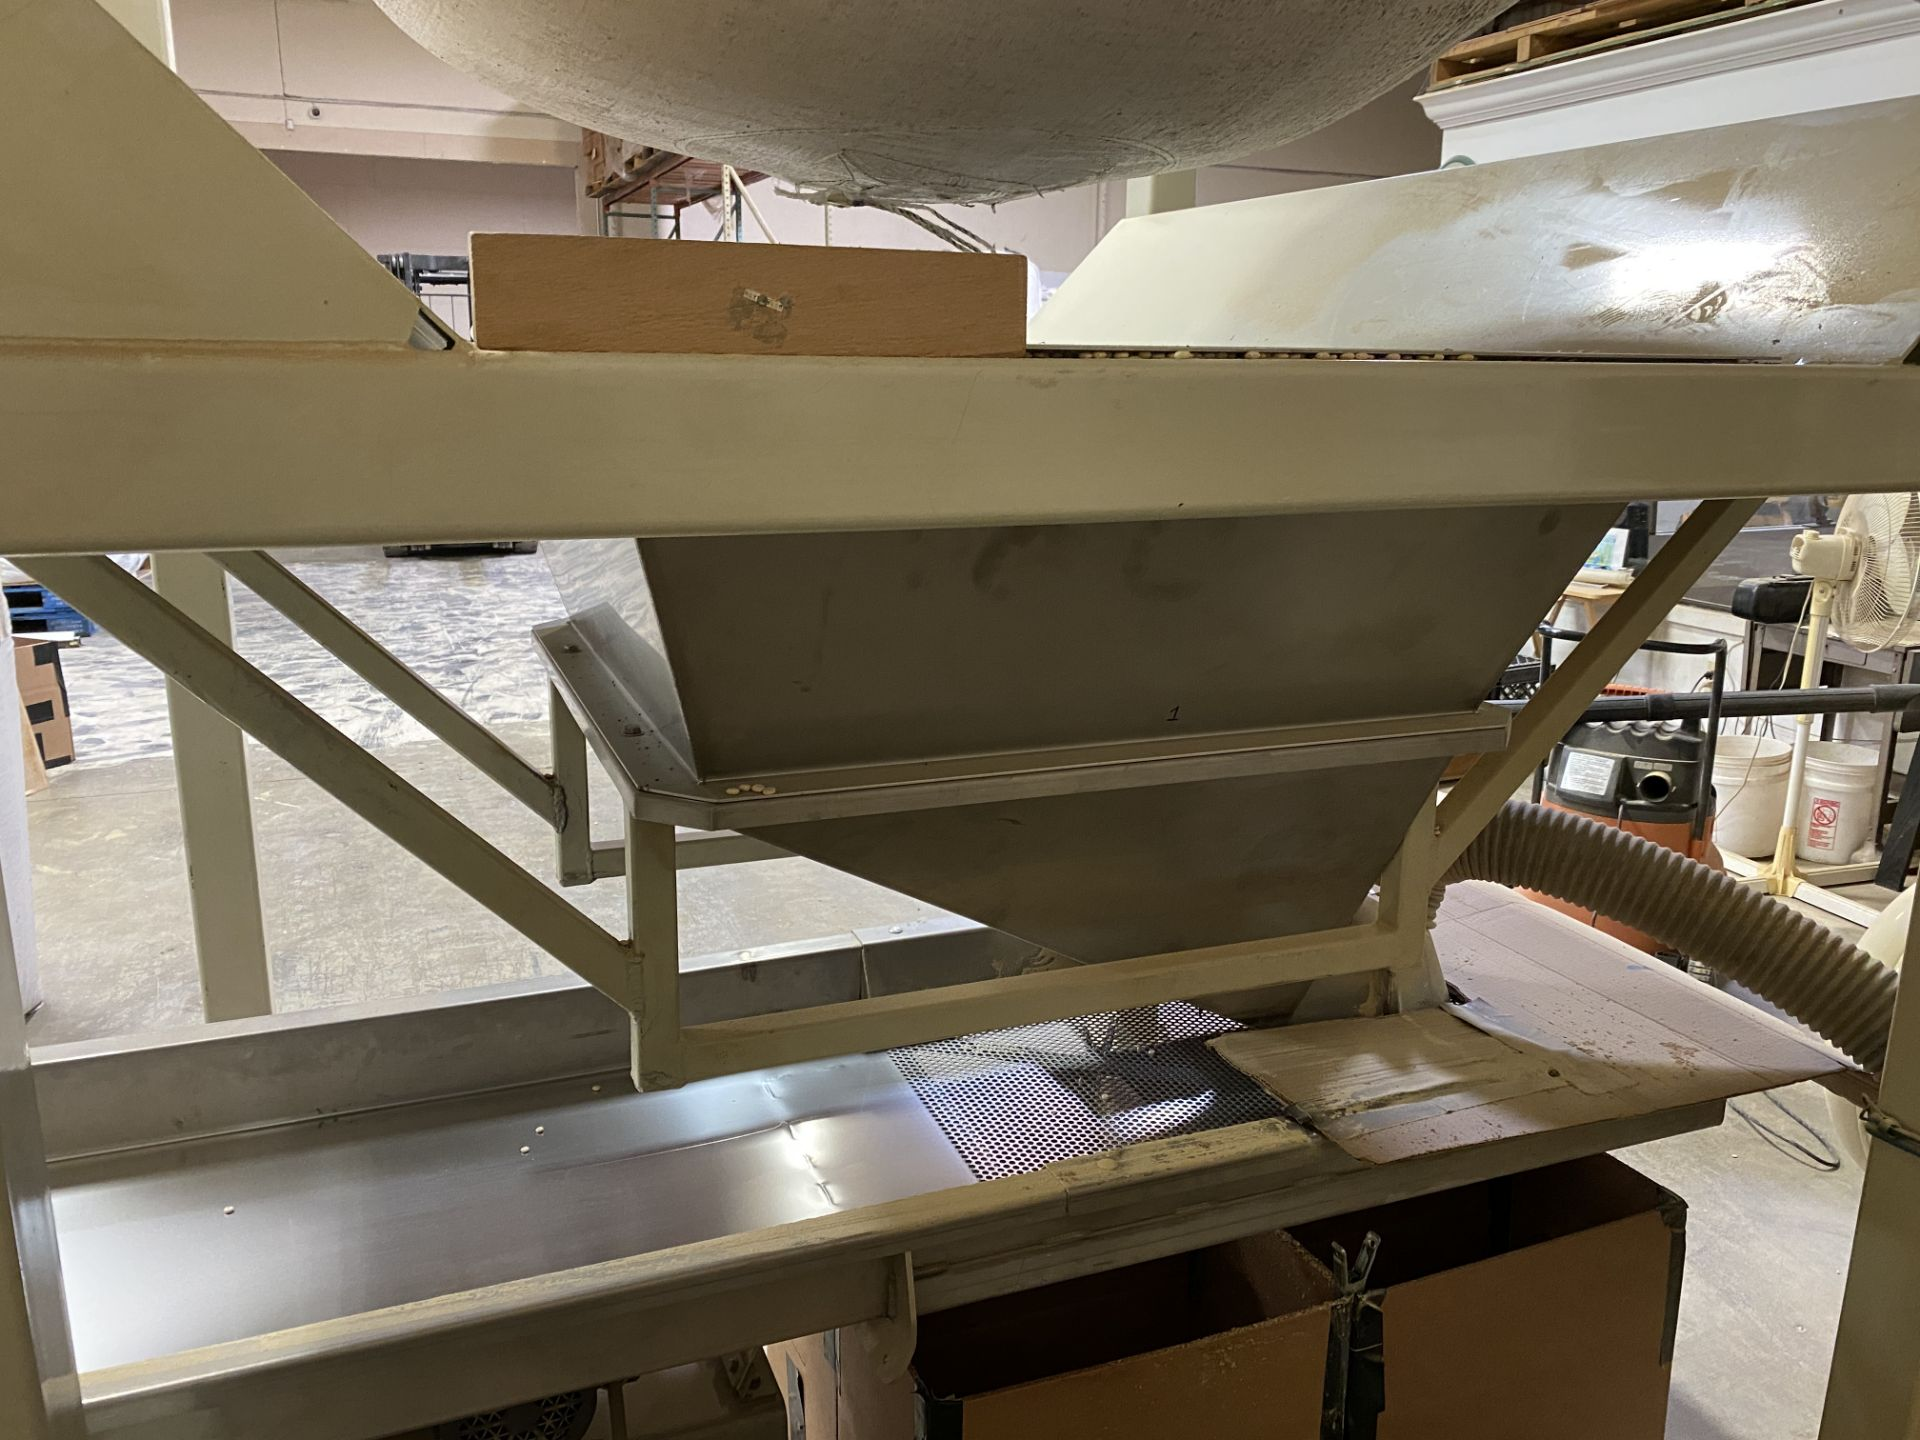 Lot 101 - Supersack Unloading Stations